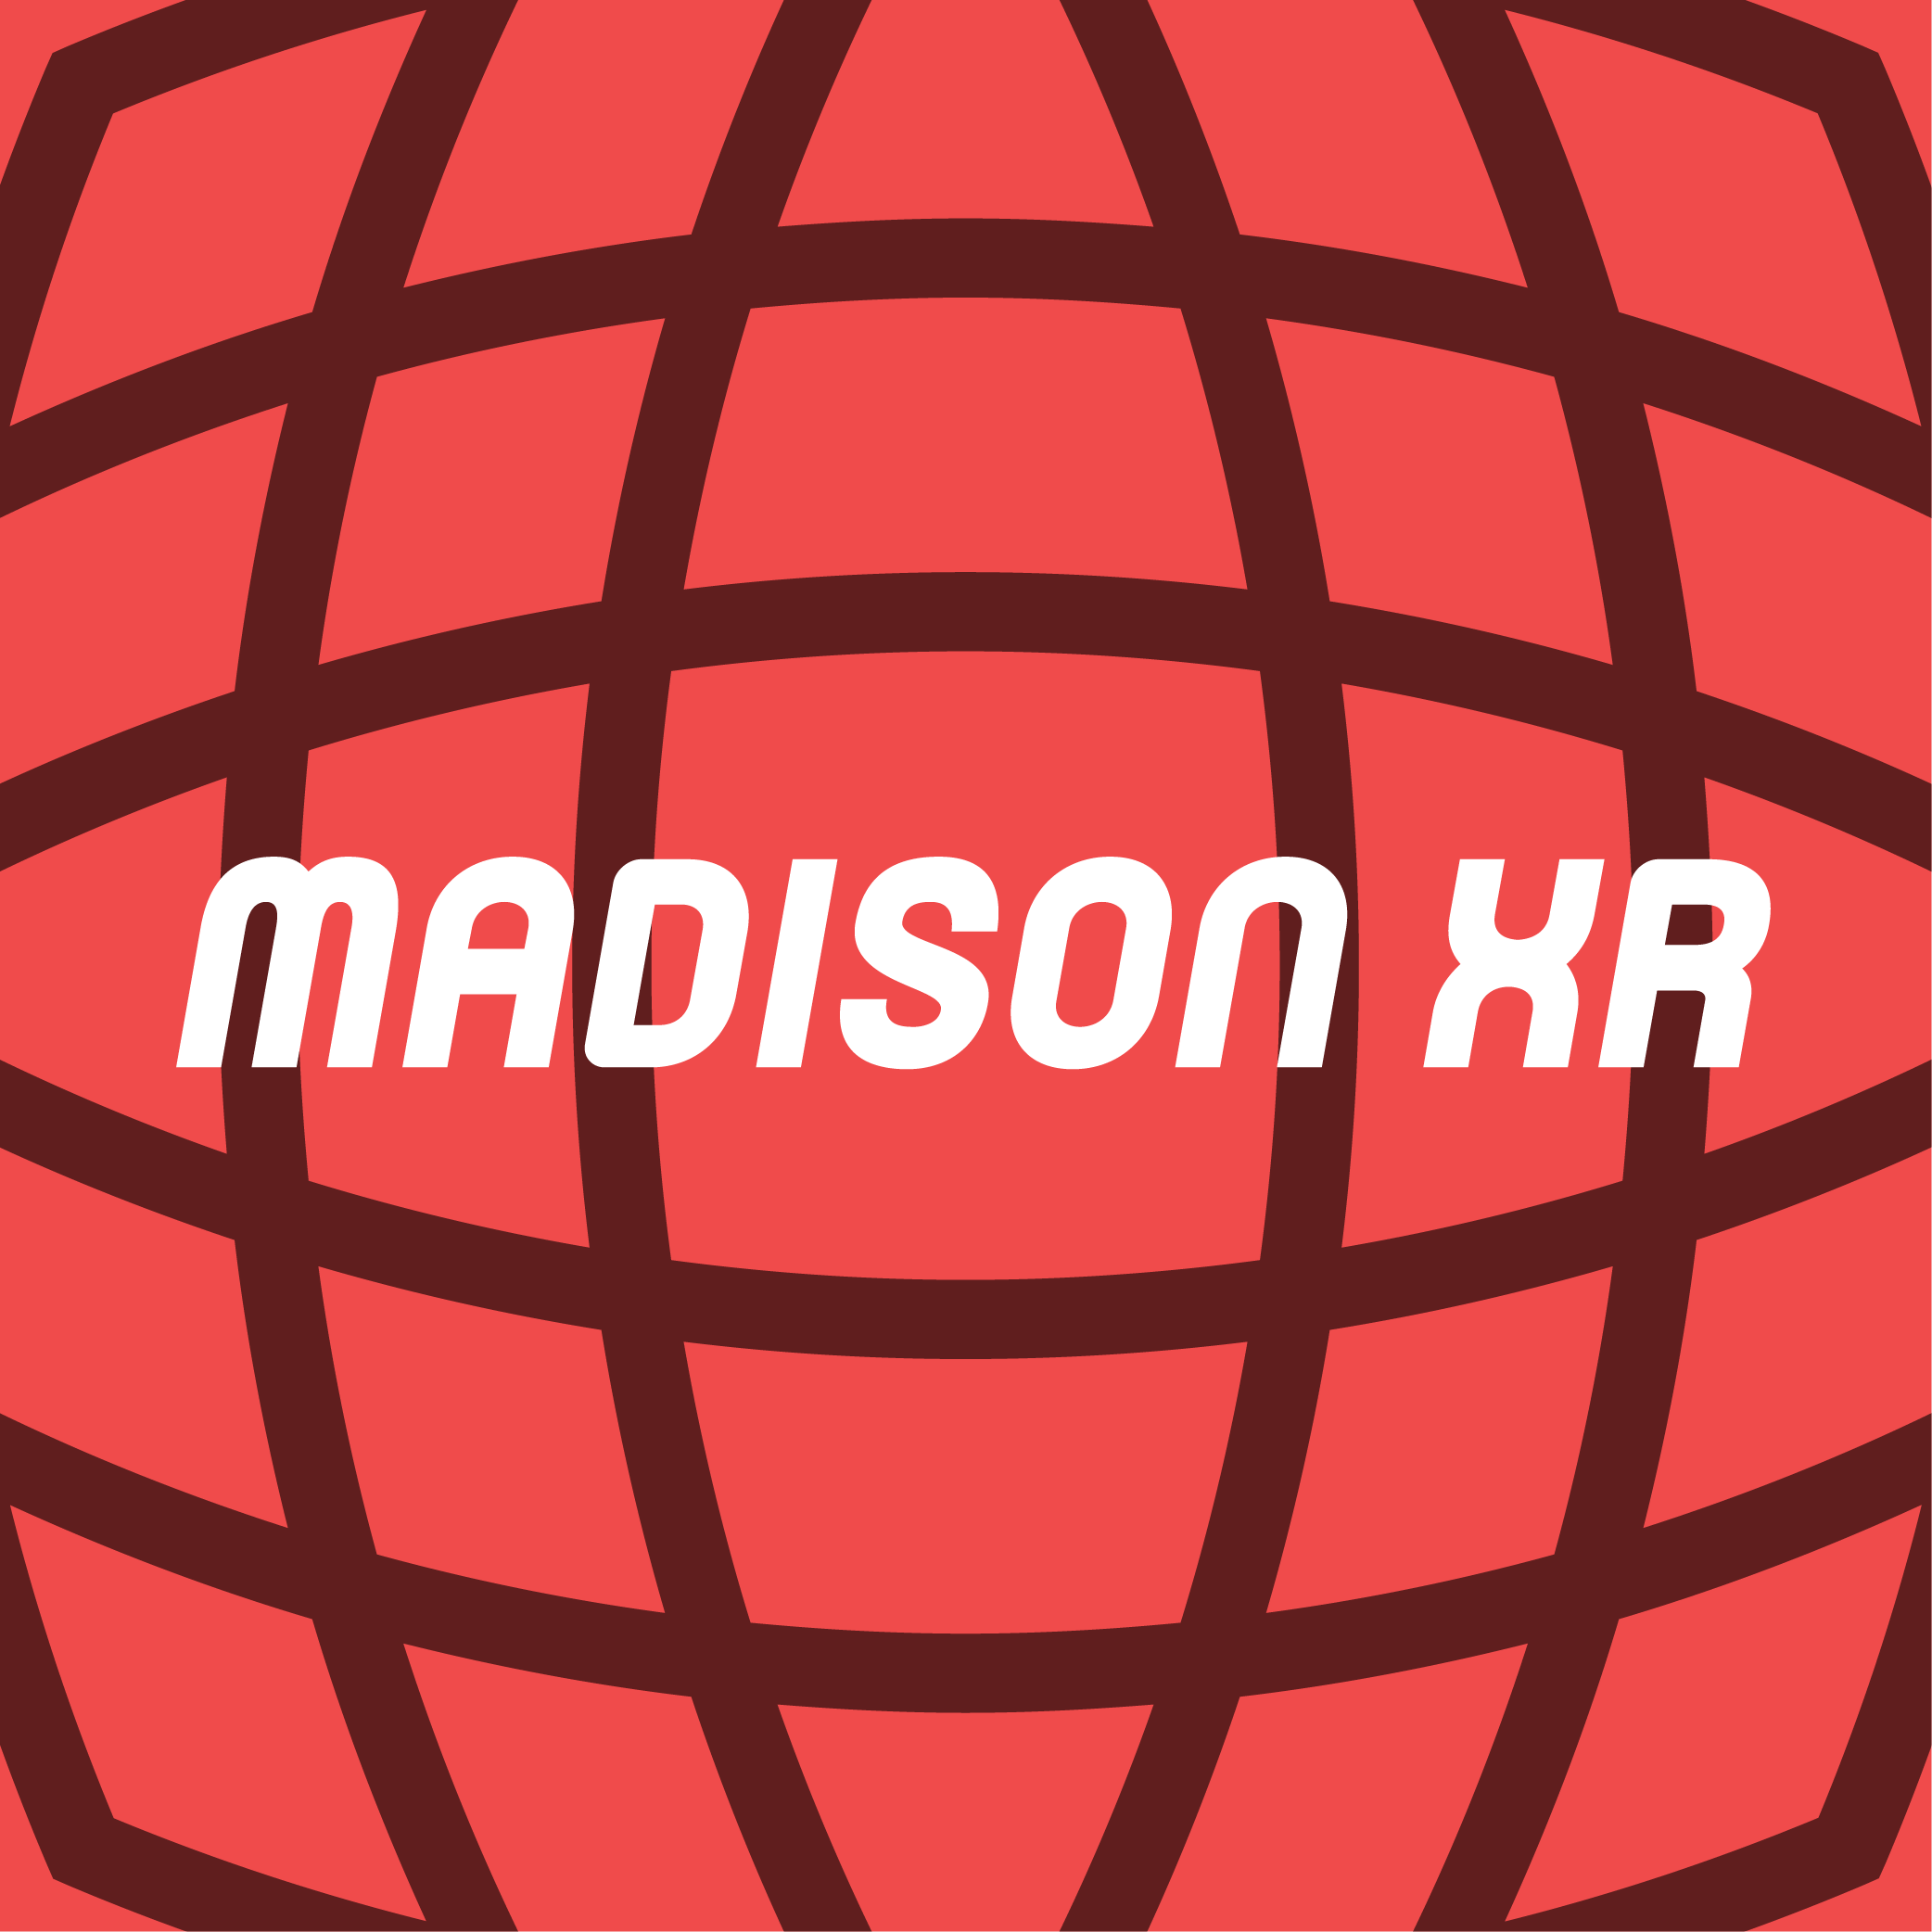 Madison XR